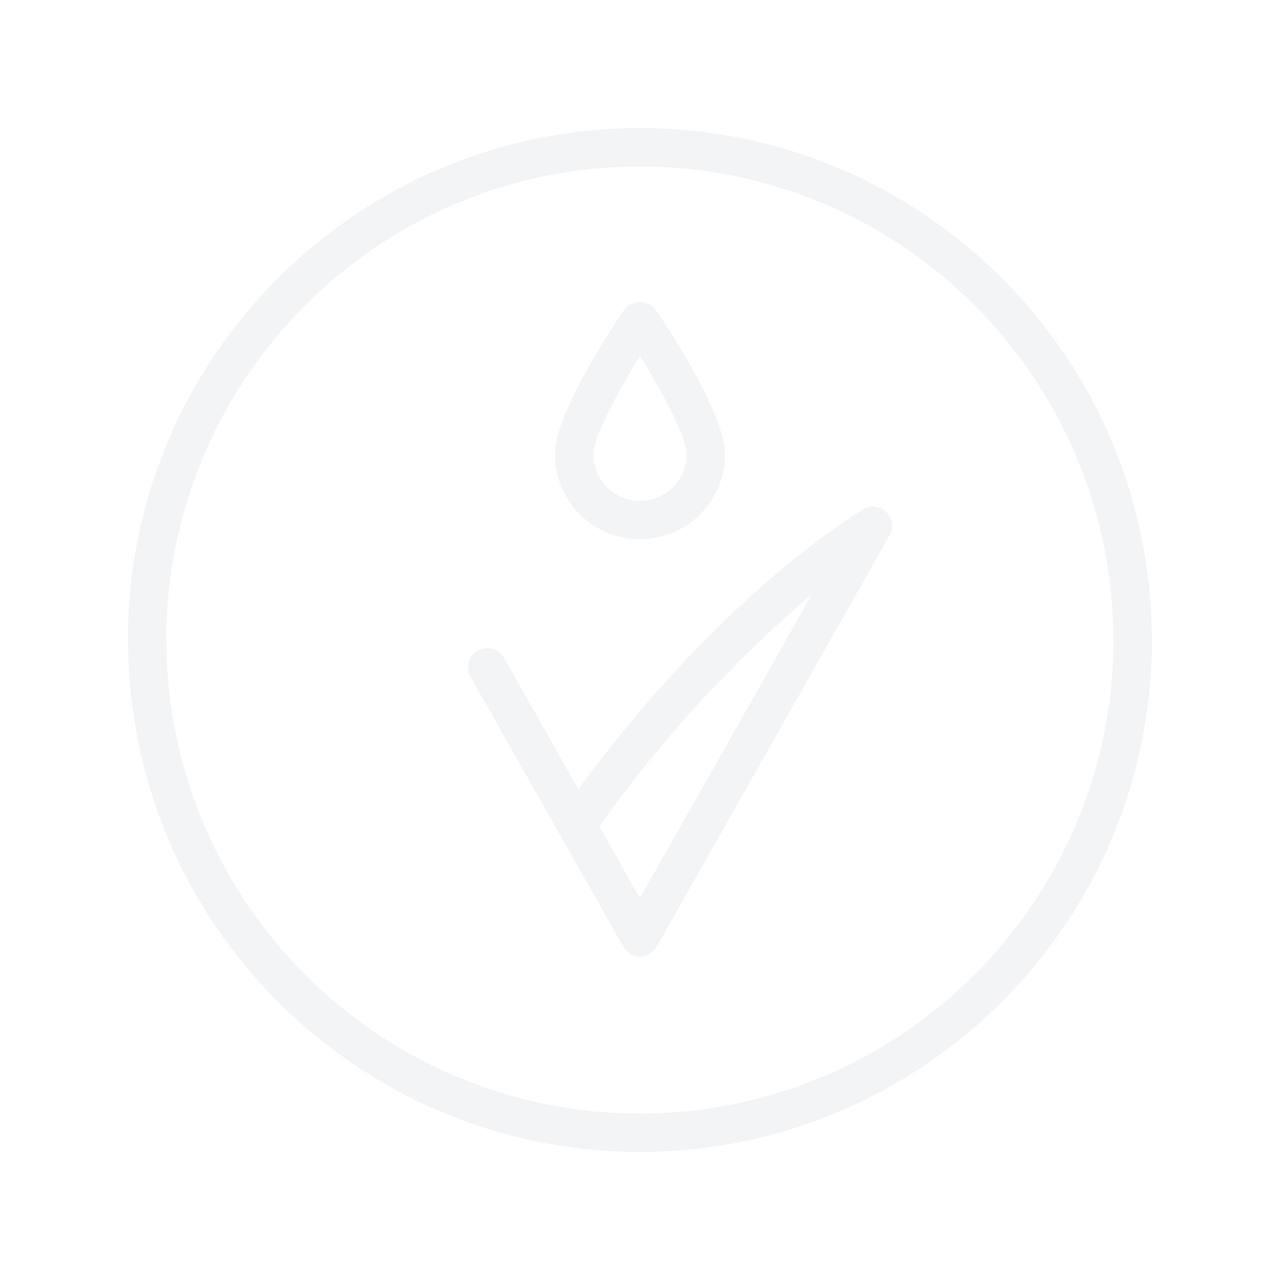 DECLEOR Hydra Floral Everfresh Light Cream 50ml (Tube)